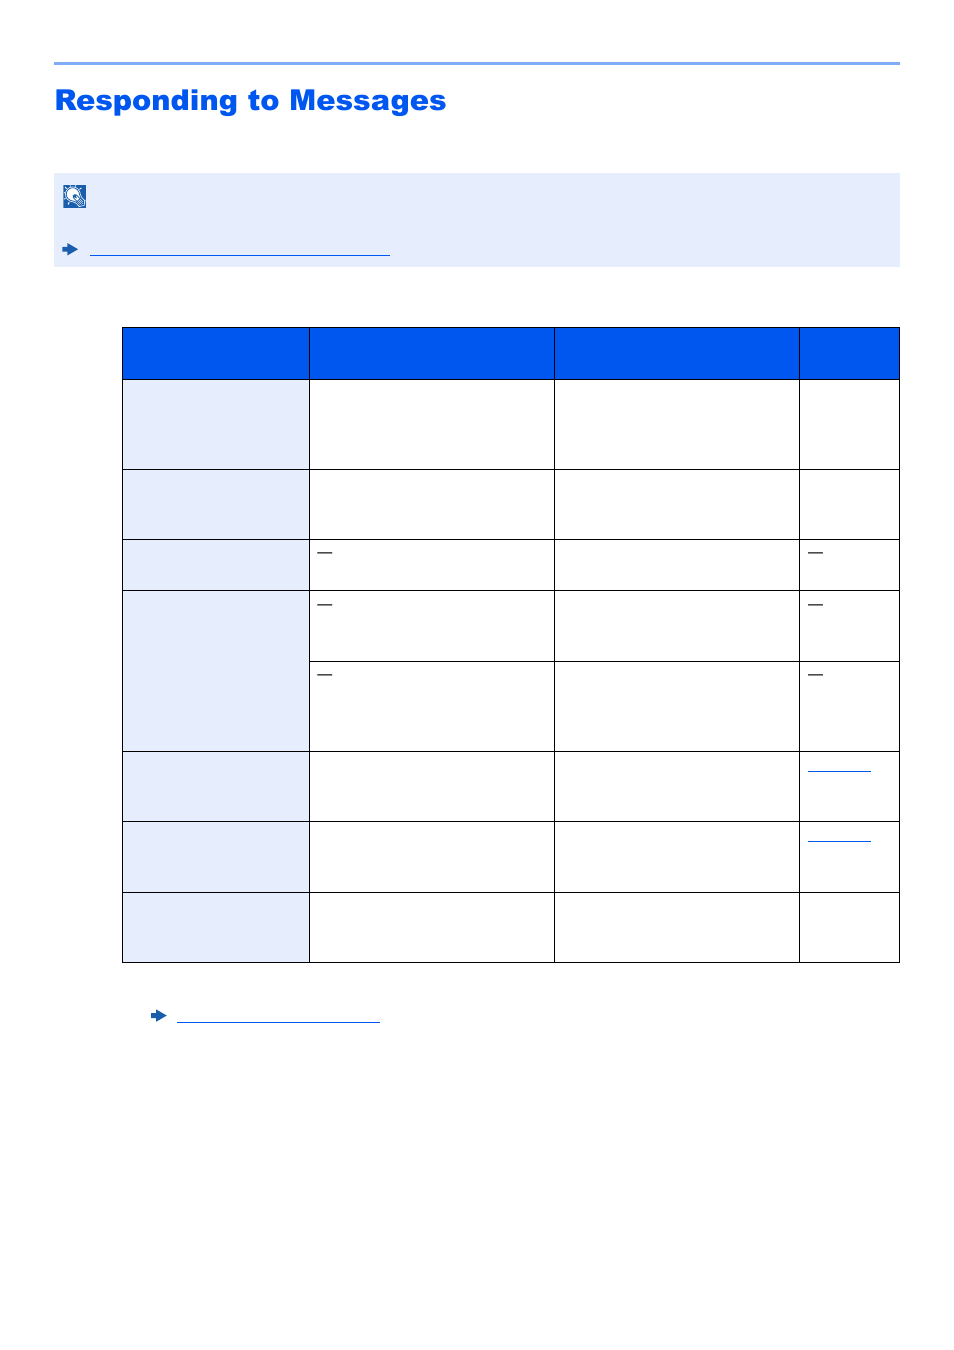 Responding to messages, Responding to messages -32 | Kyocera